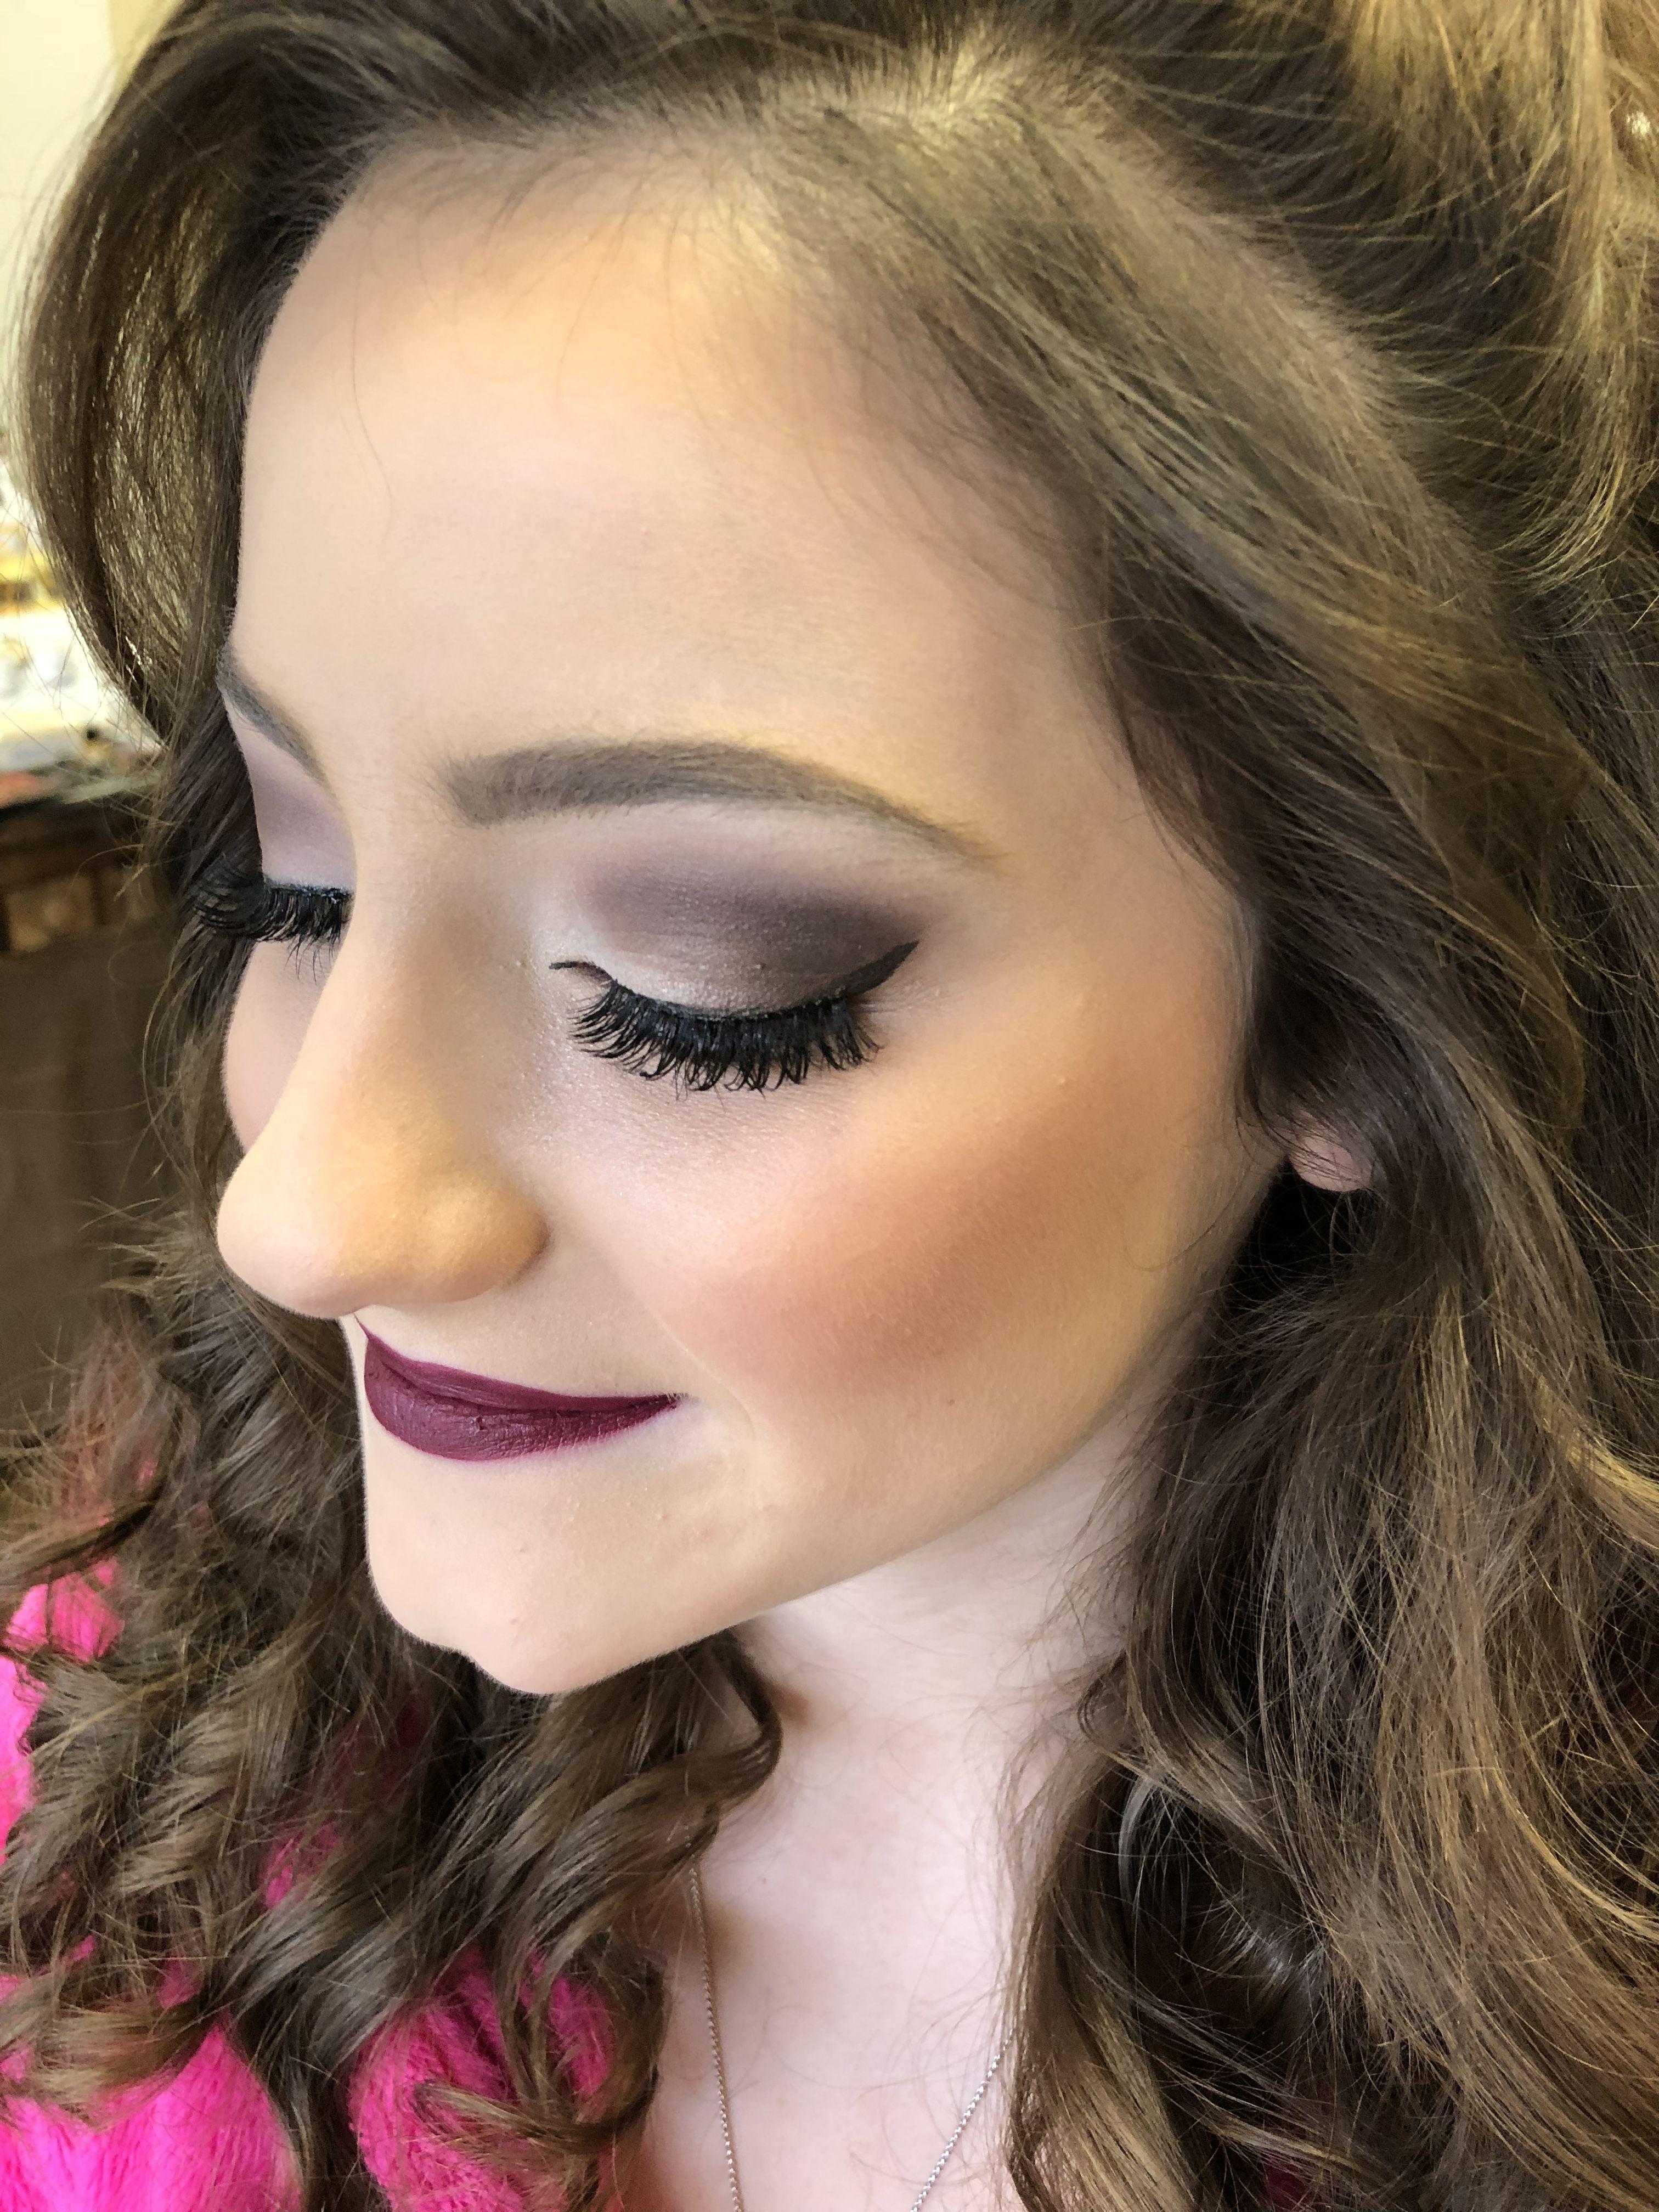 Prom Makeup Done With Bareminerals Makeup Smokey Eye Plum Lip